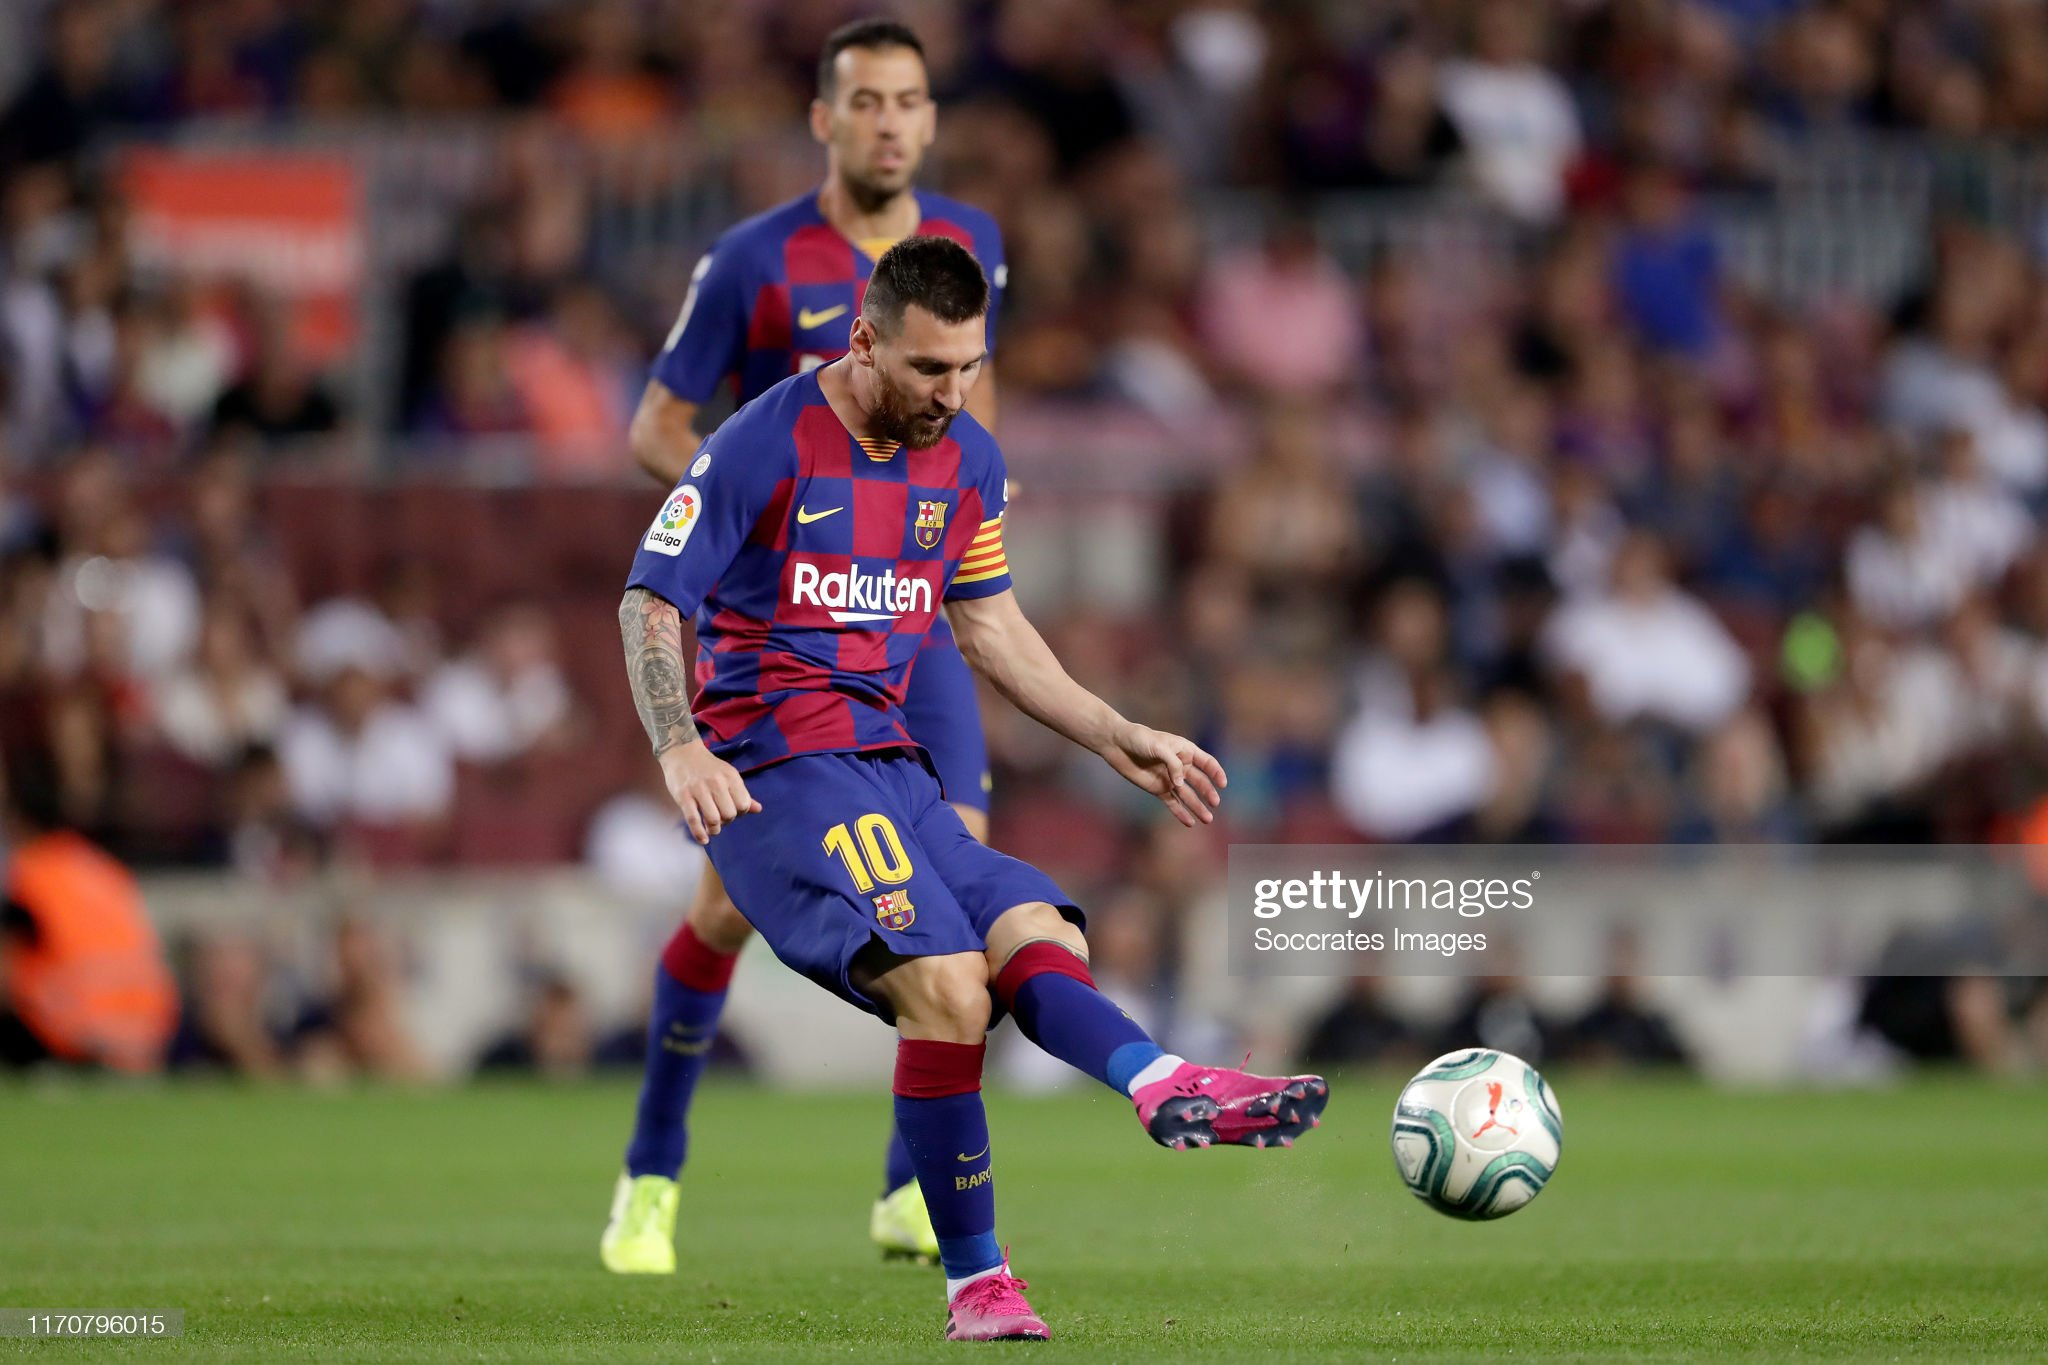 صور مباراة : برشلونة - فياريال 2-1 ( 24-09-2019 )  Lionel-messi-of-fc-barcelona-during-the-la-liga-santander-match-fc-picture-id1170796015?s=2048x2048